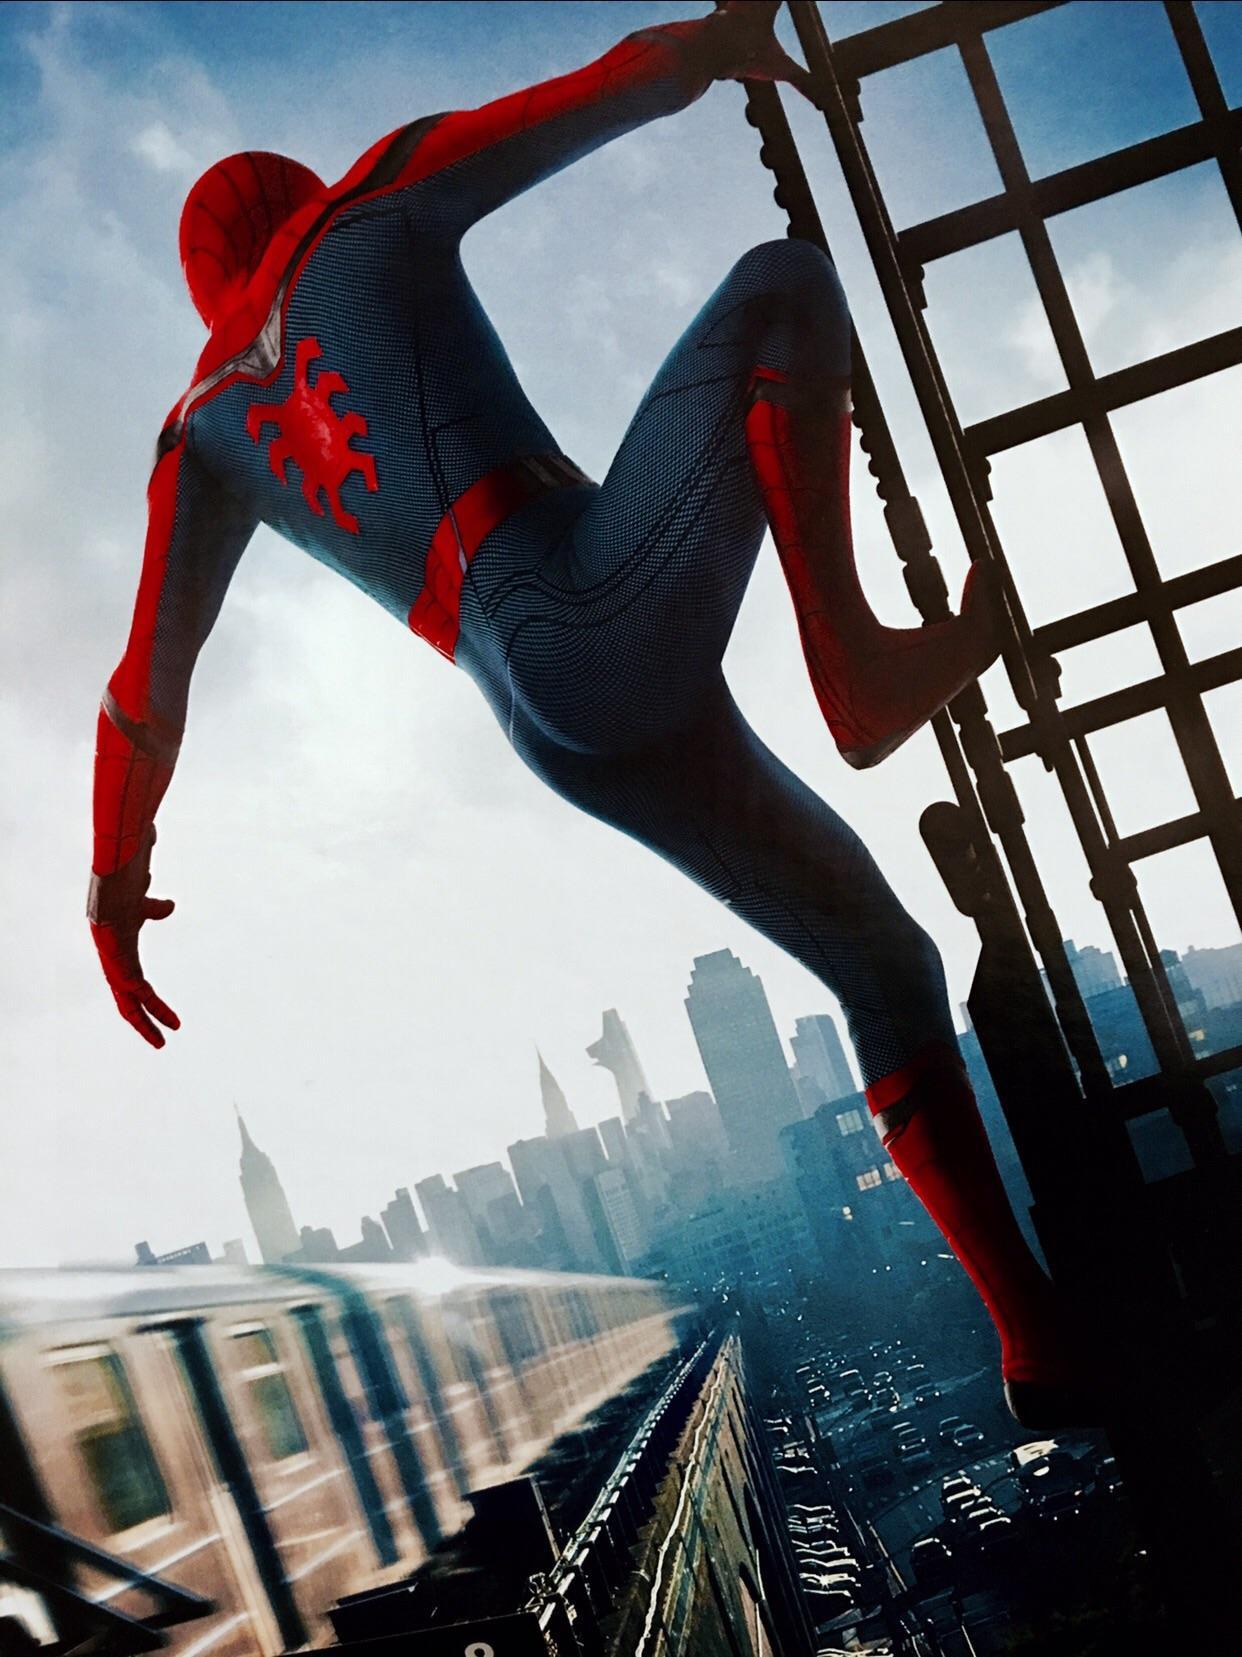 If anyone wants a Spider Man Homecoming phone wallpaper heres 1242x1657